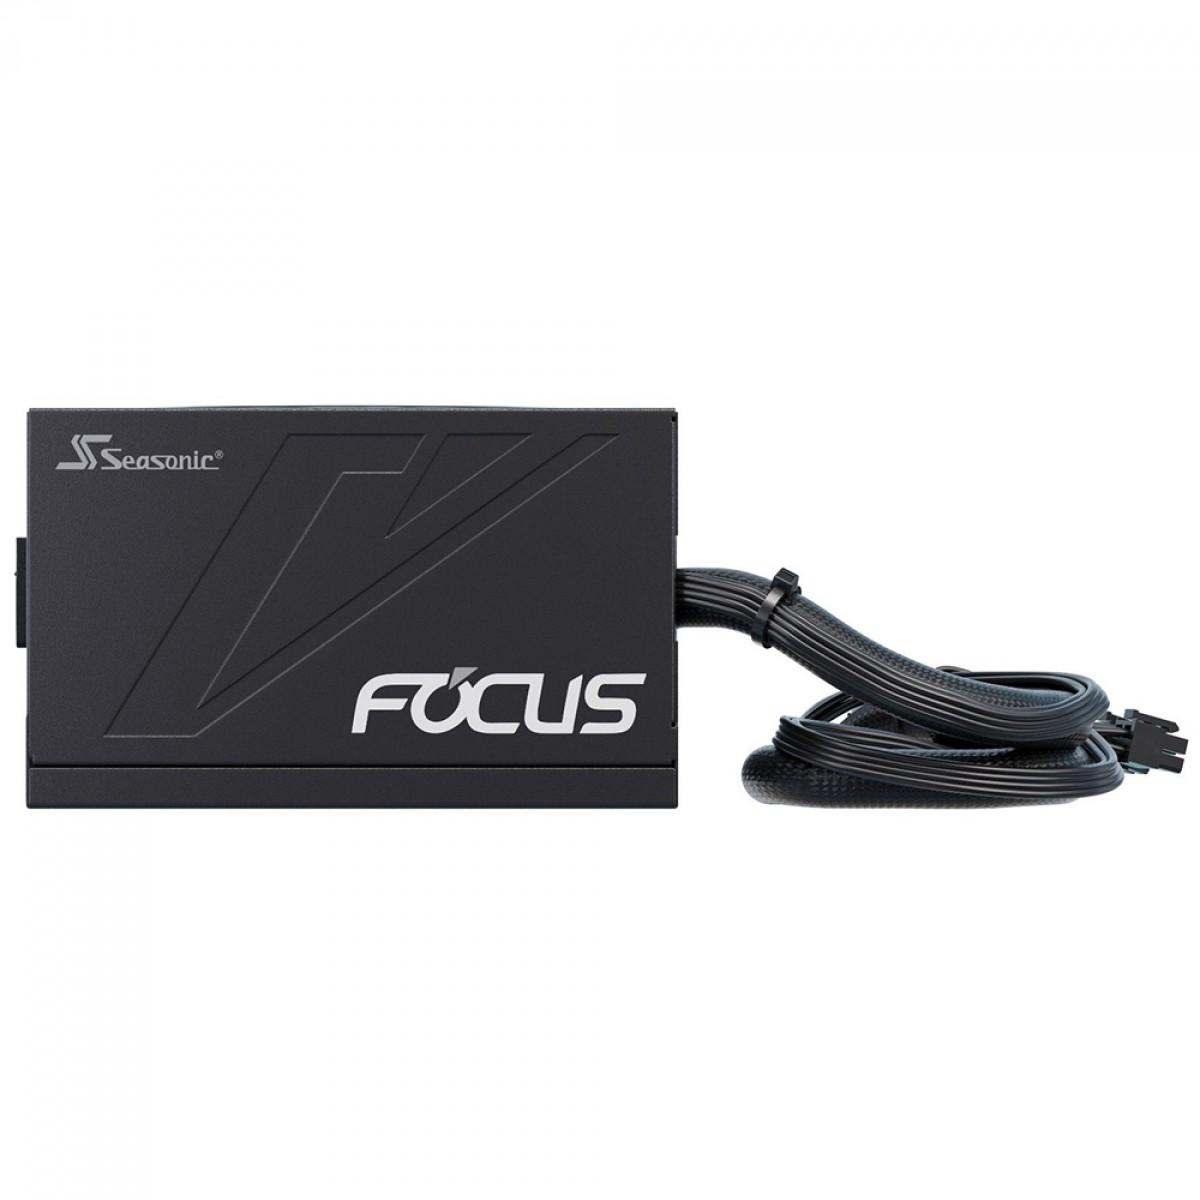 Fonte Seasonic Focus GM-750, 750W, 80 Plus Gold, Semi Modular